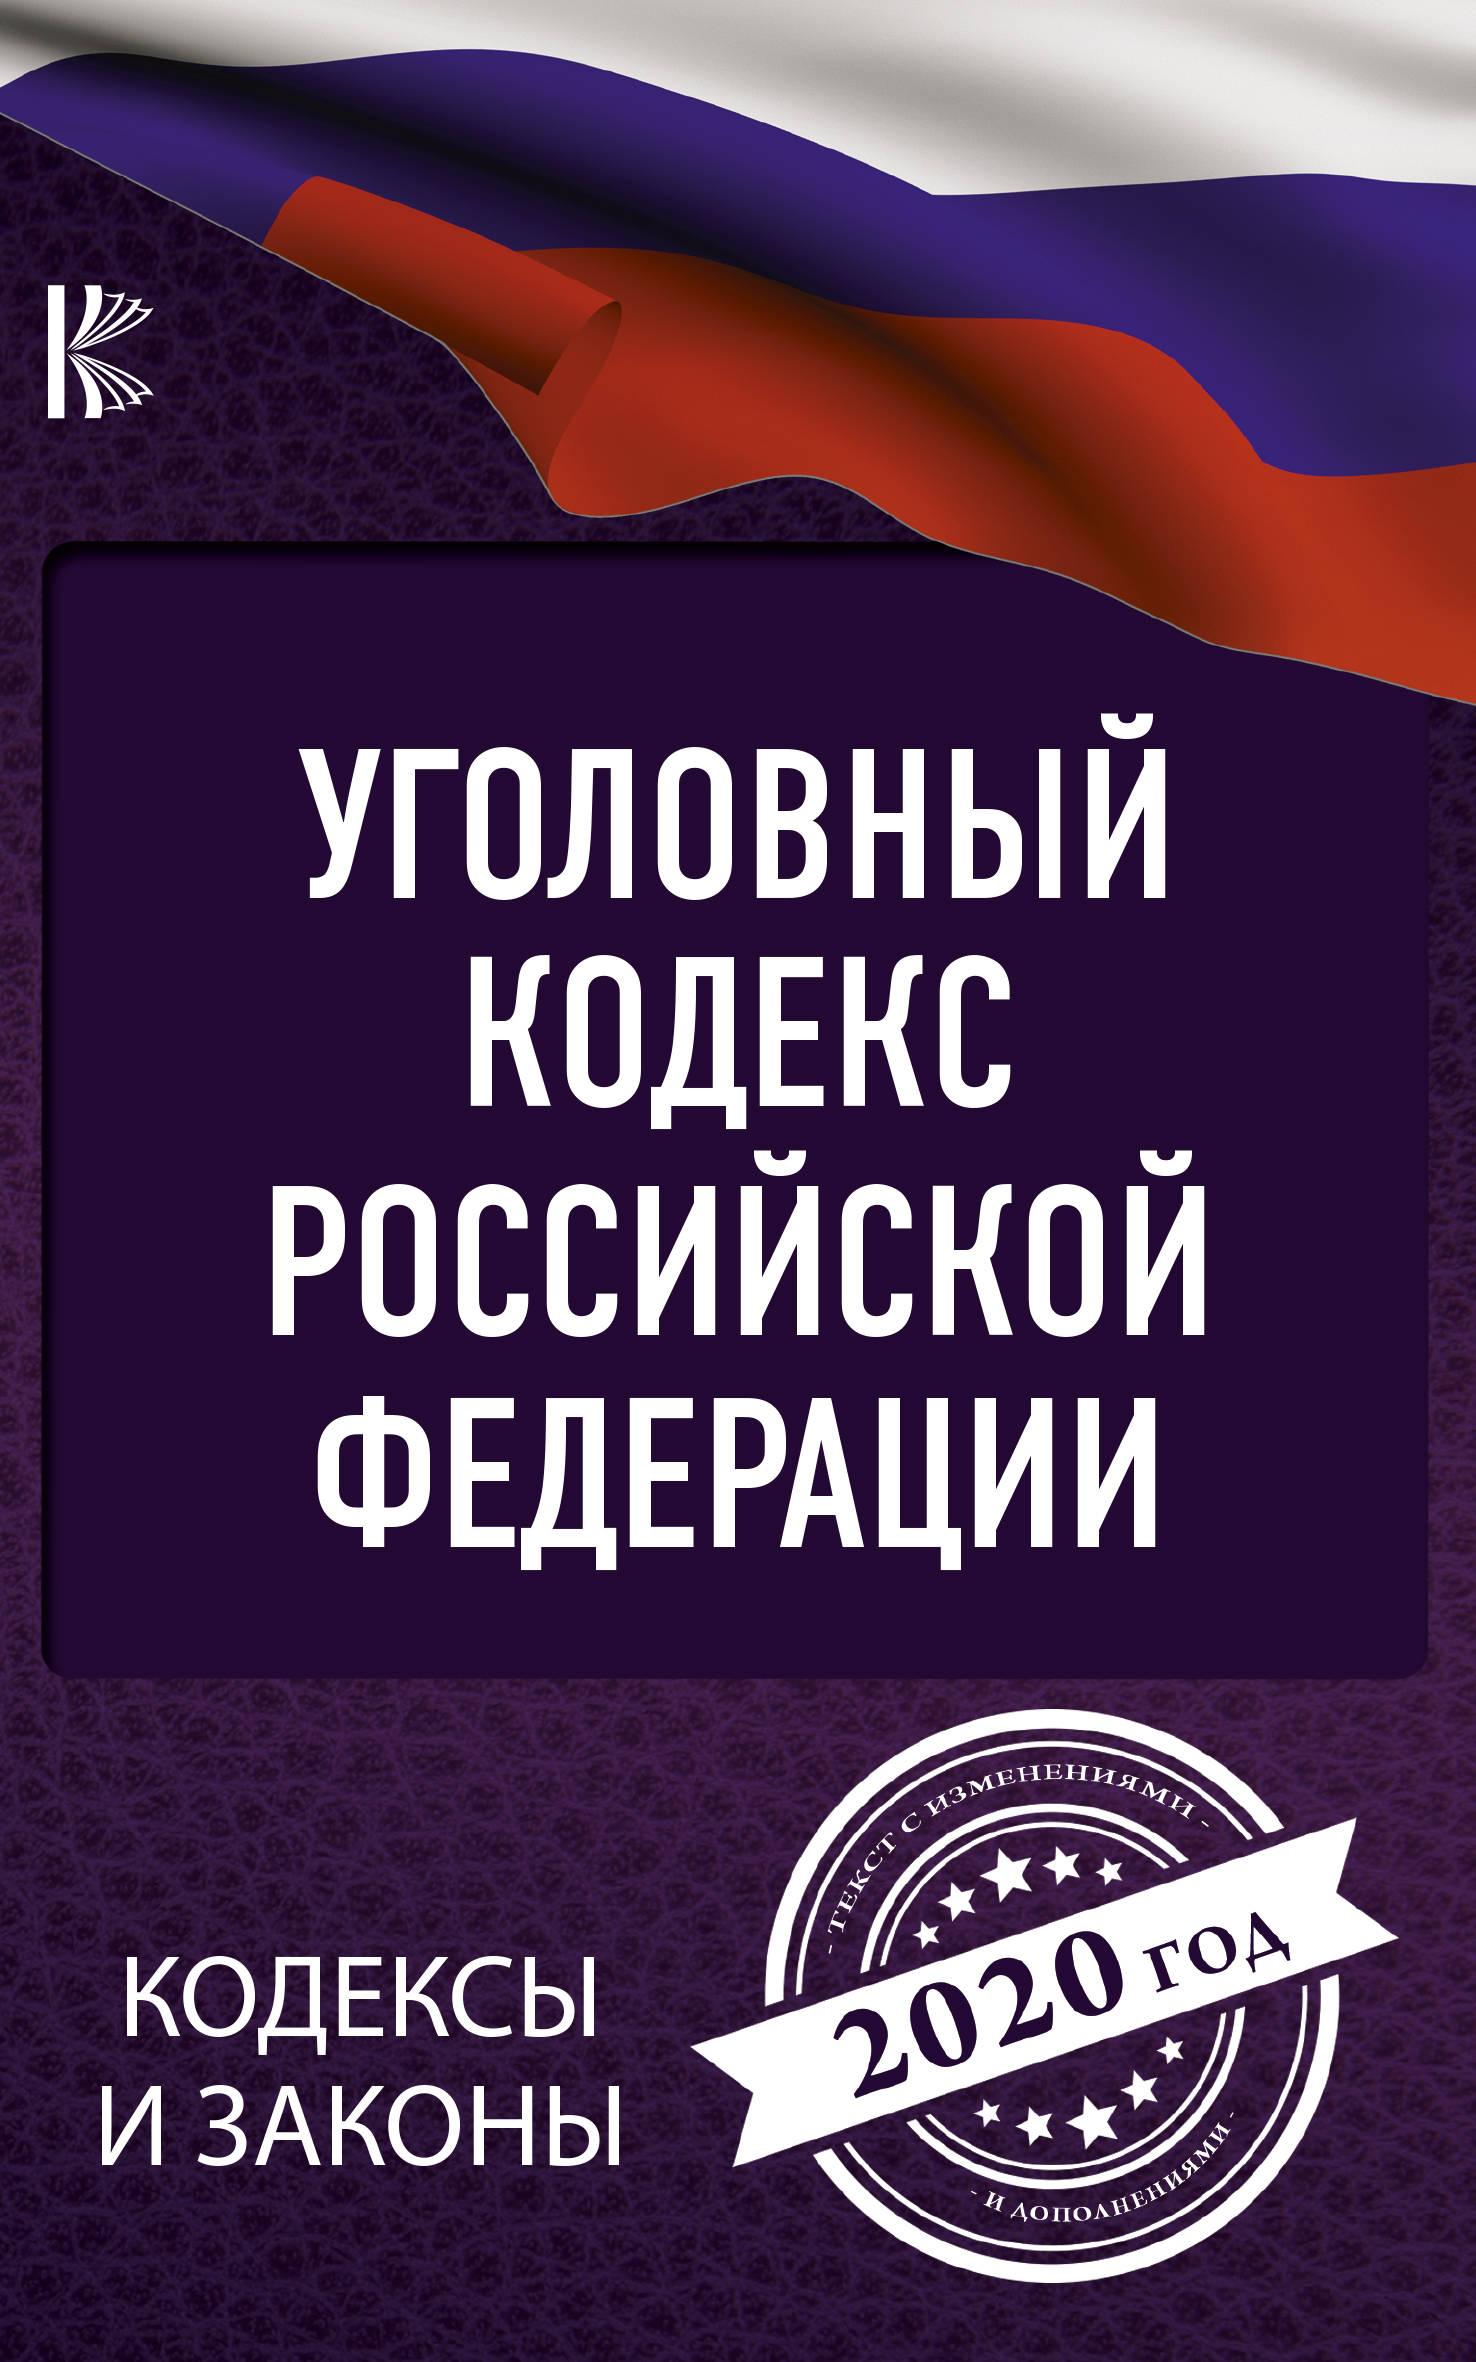 Ugolovnyj Kodeks Rossijskoj Federatsii na 2020 god